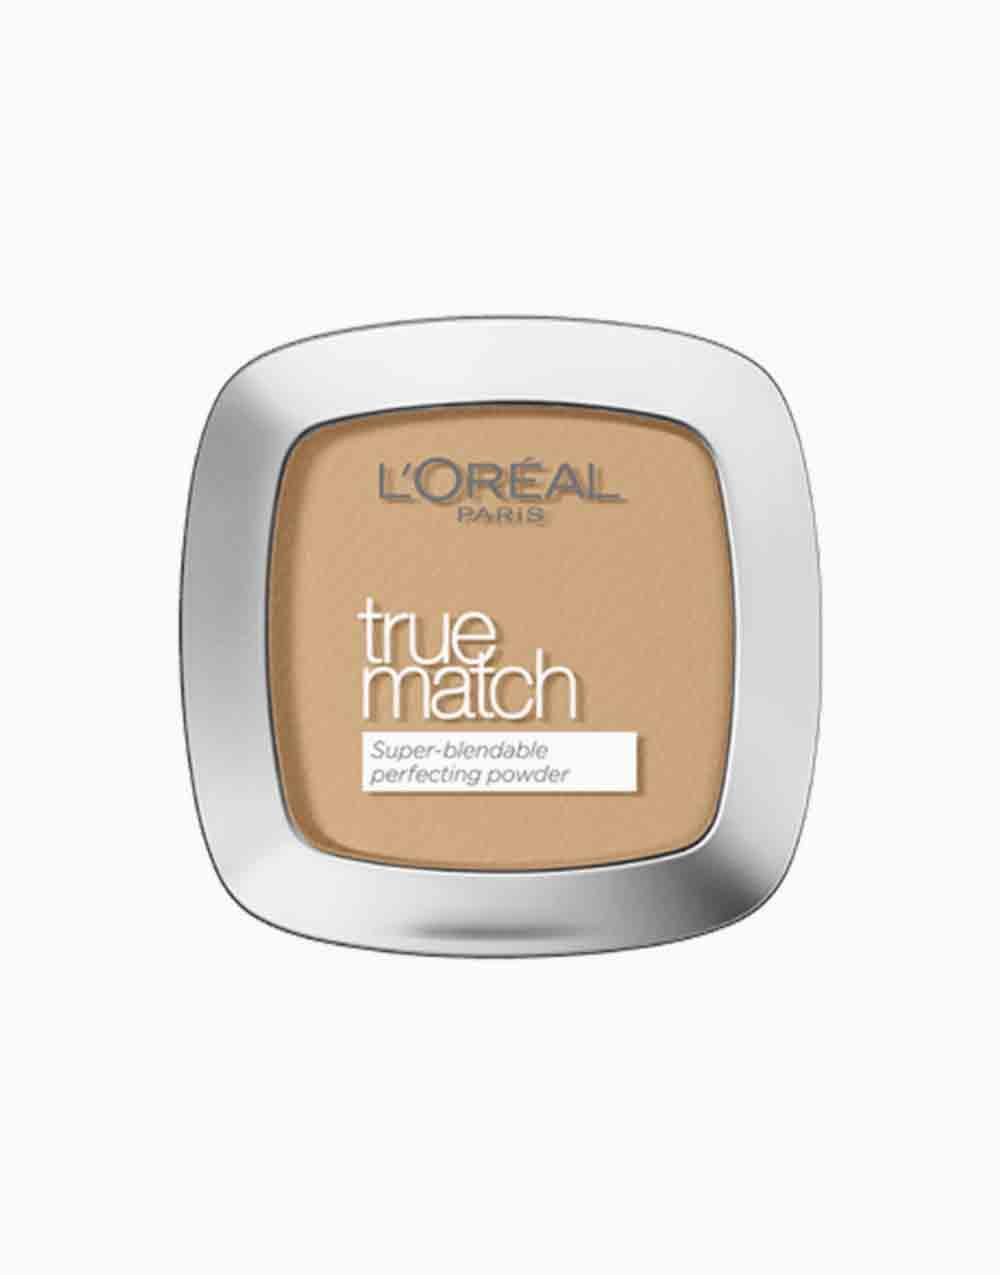 True Match Skin-Caring Skin-Matching Pressed Powder by L'Oréal Paris | 2R Rose Vanilla